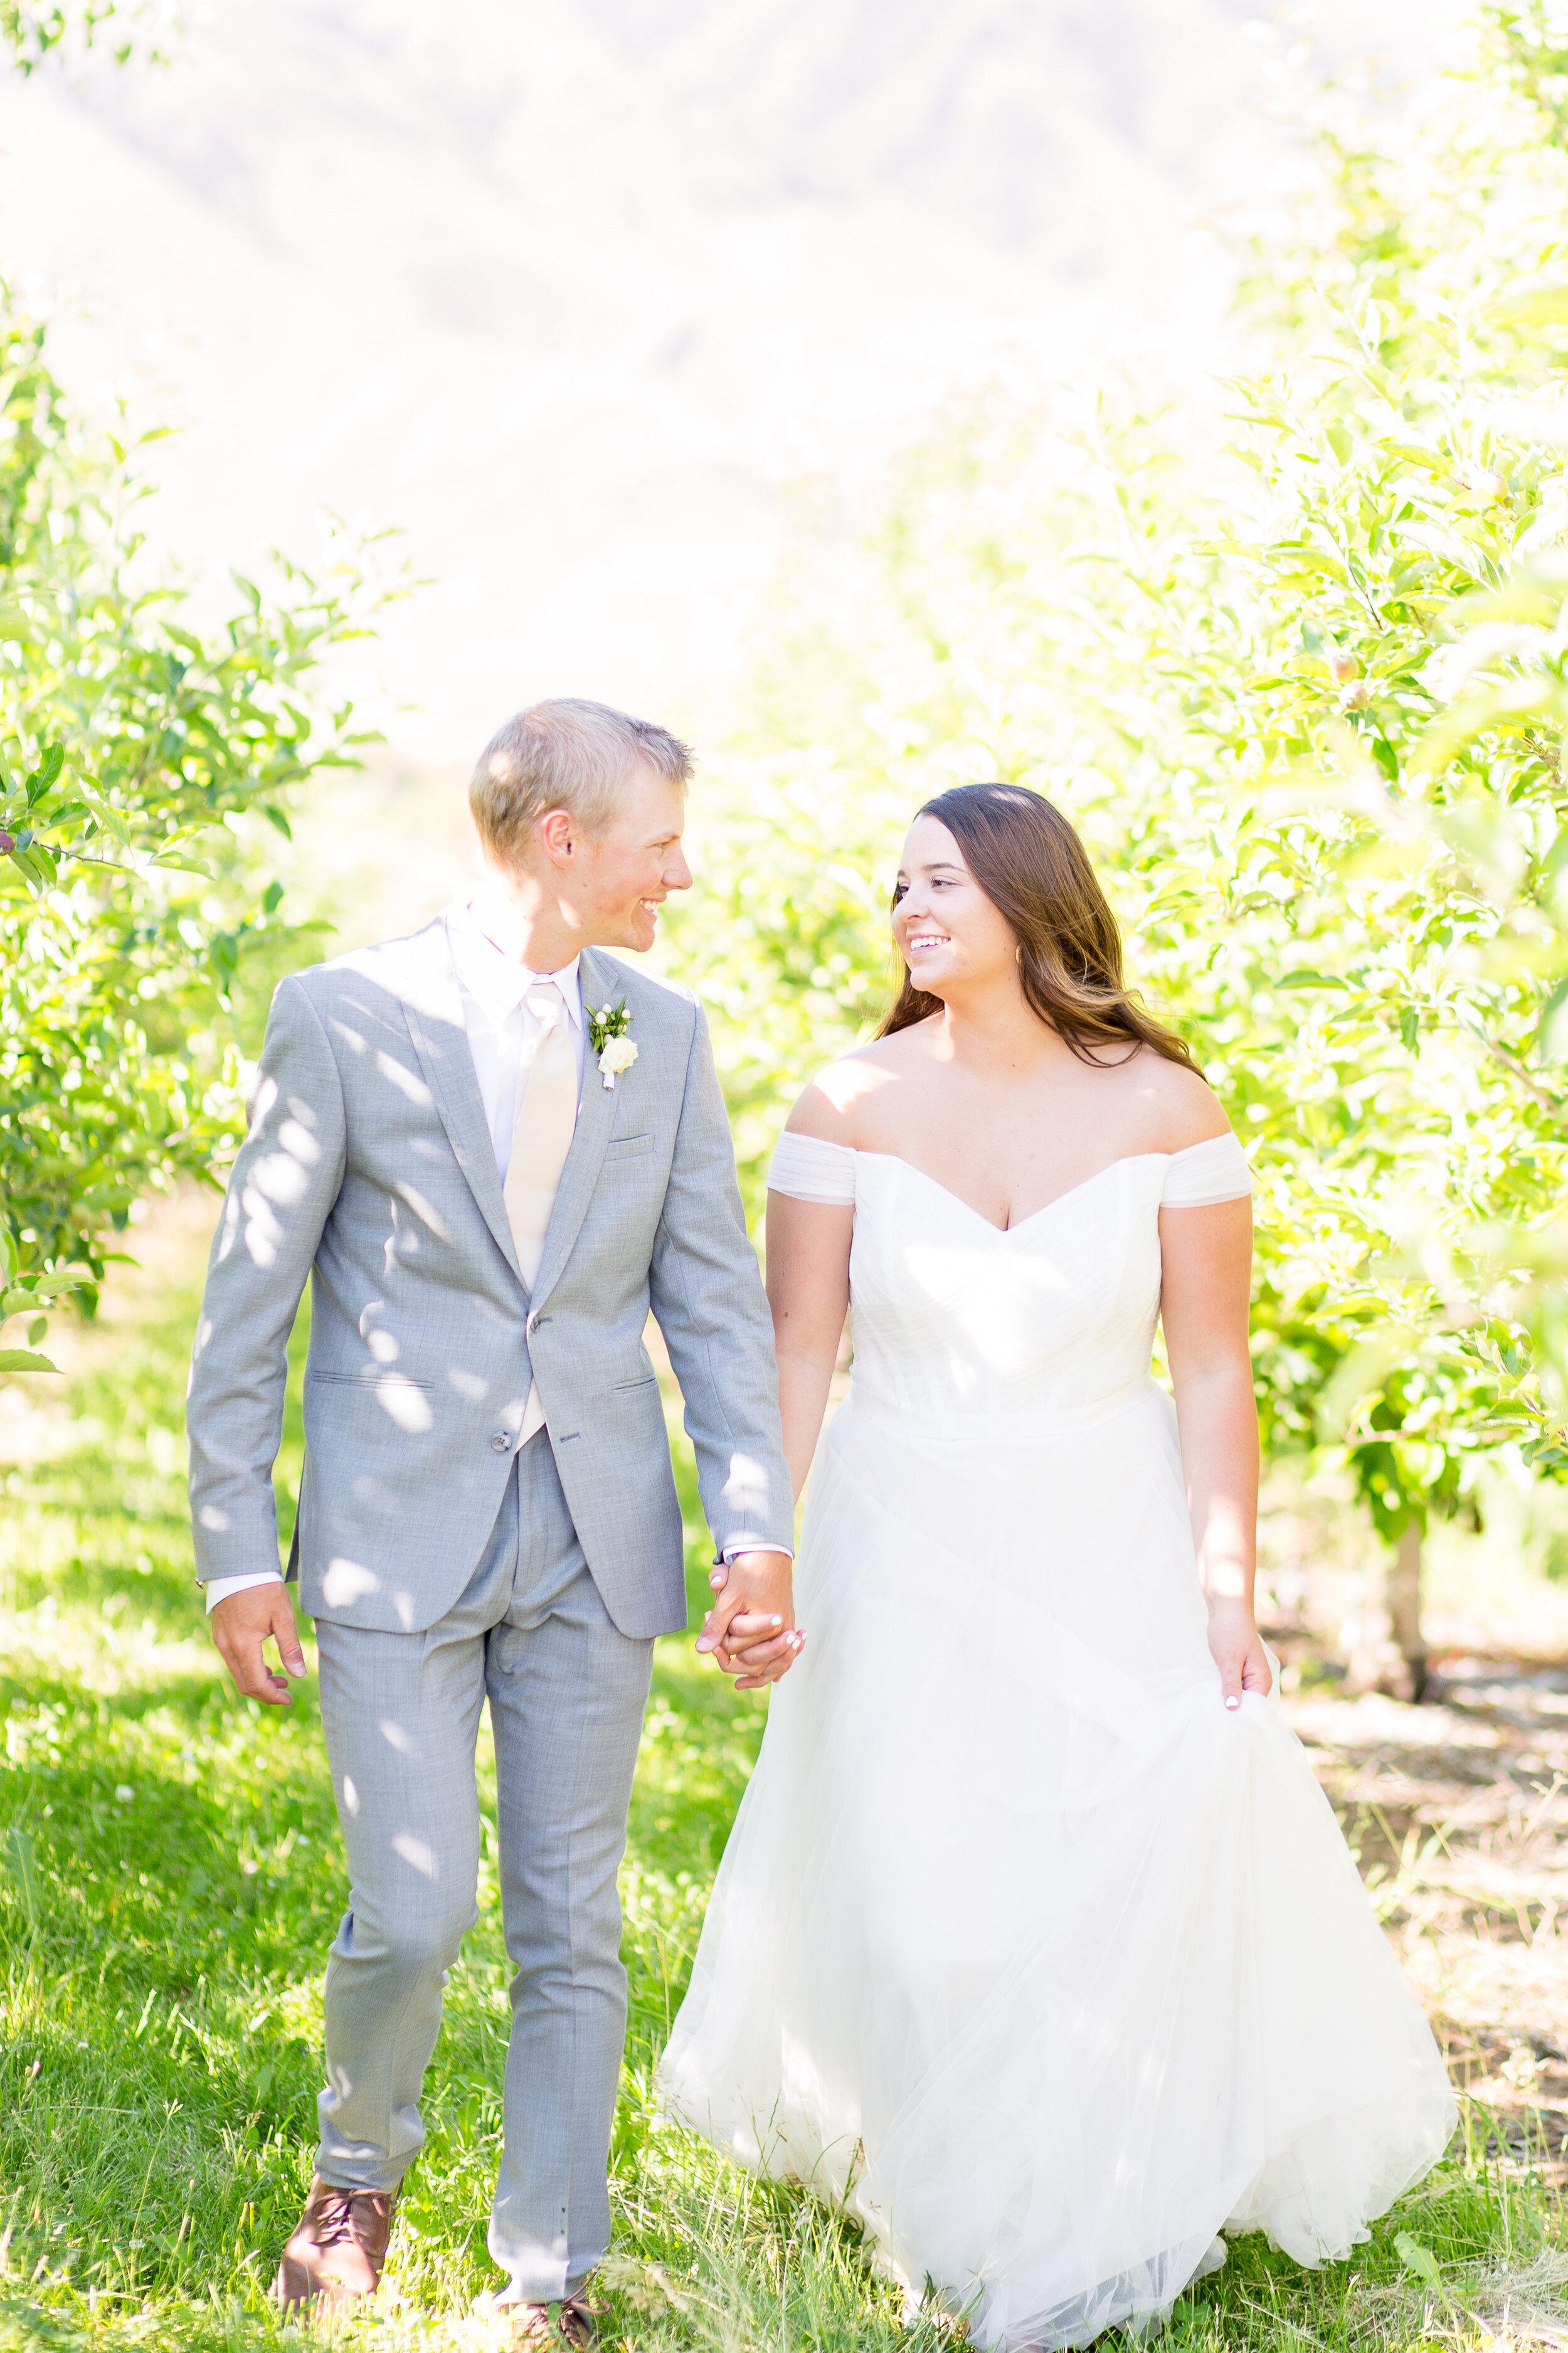 walking away spokane bride and groom